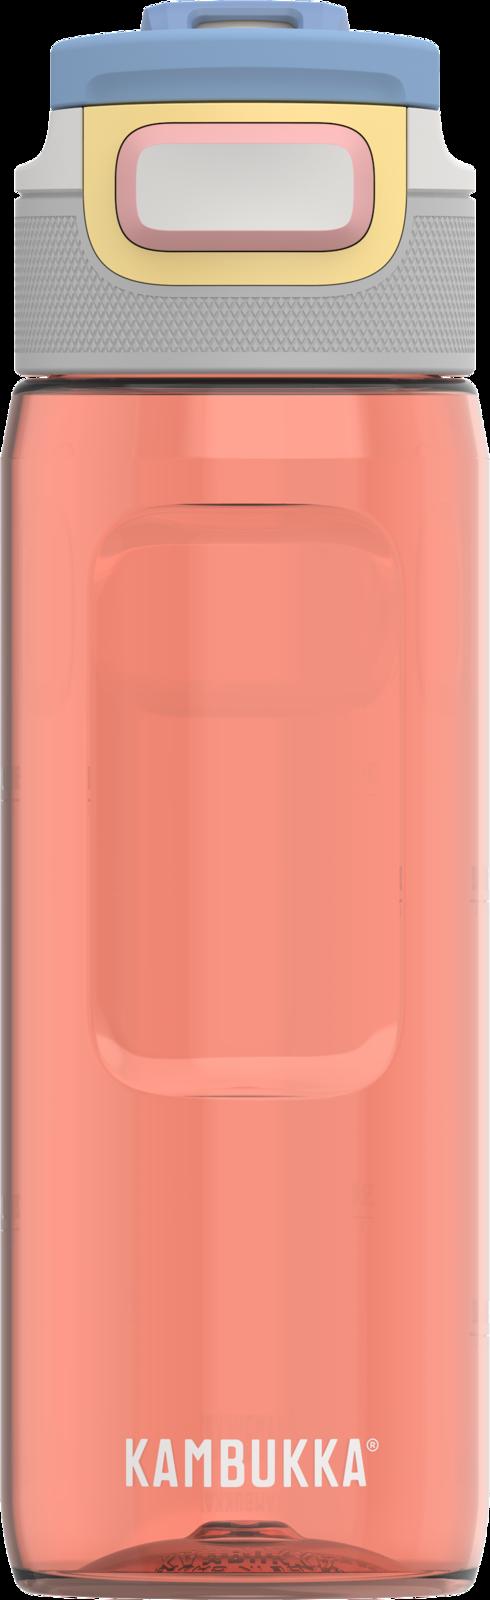 Butelka na wodę Kambukka Elton 750 ml - Amber